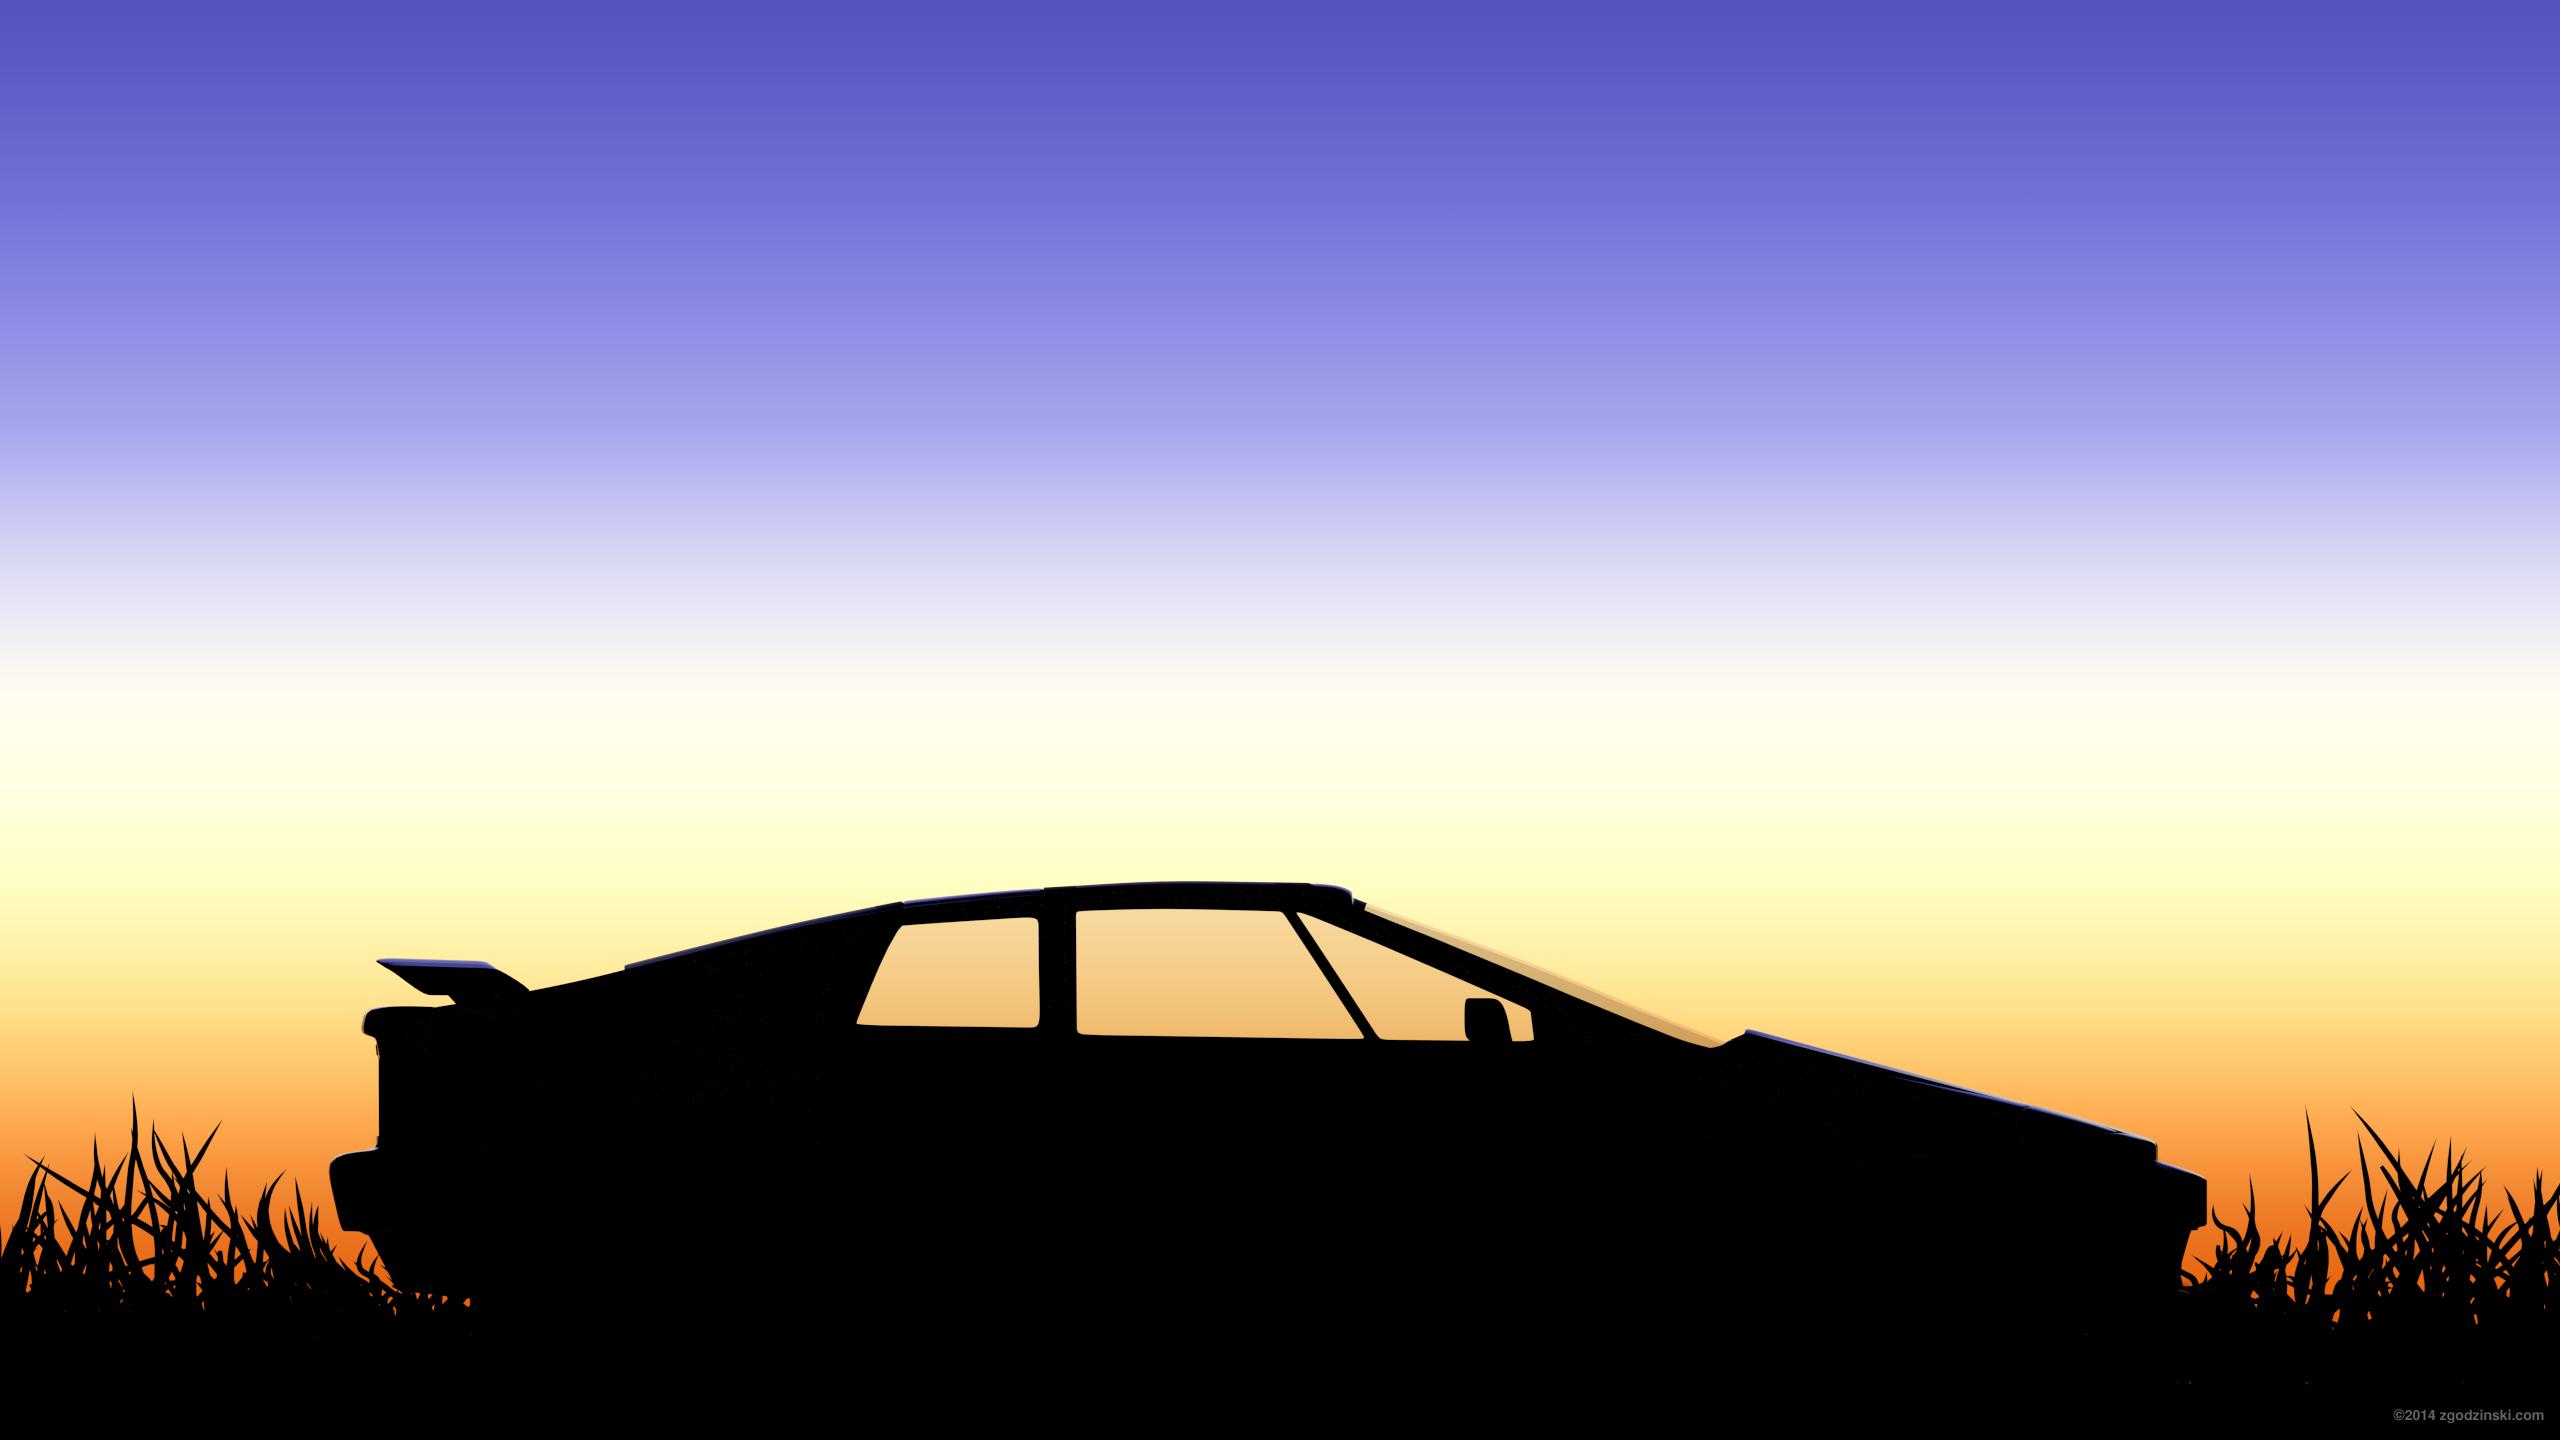 Lotus Esprit Turbo Challenge 2 Hi-Score screen by zgodzinski